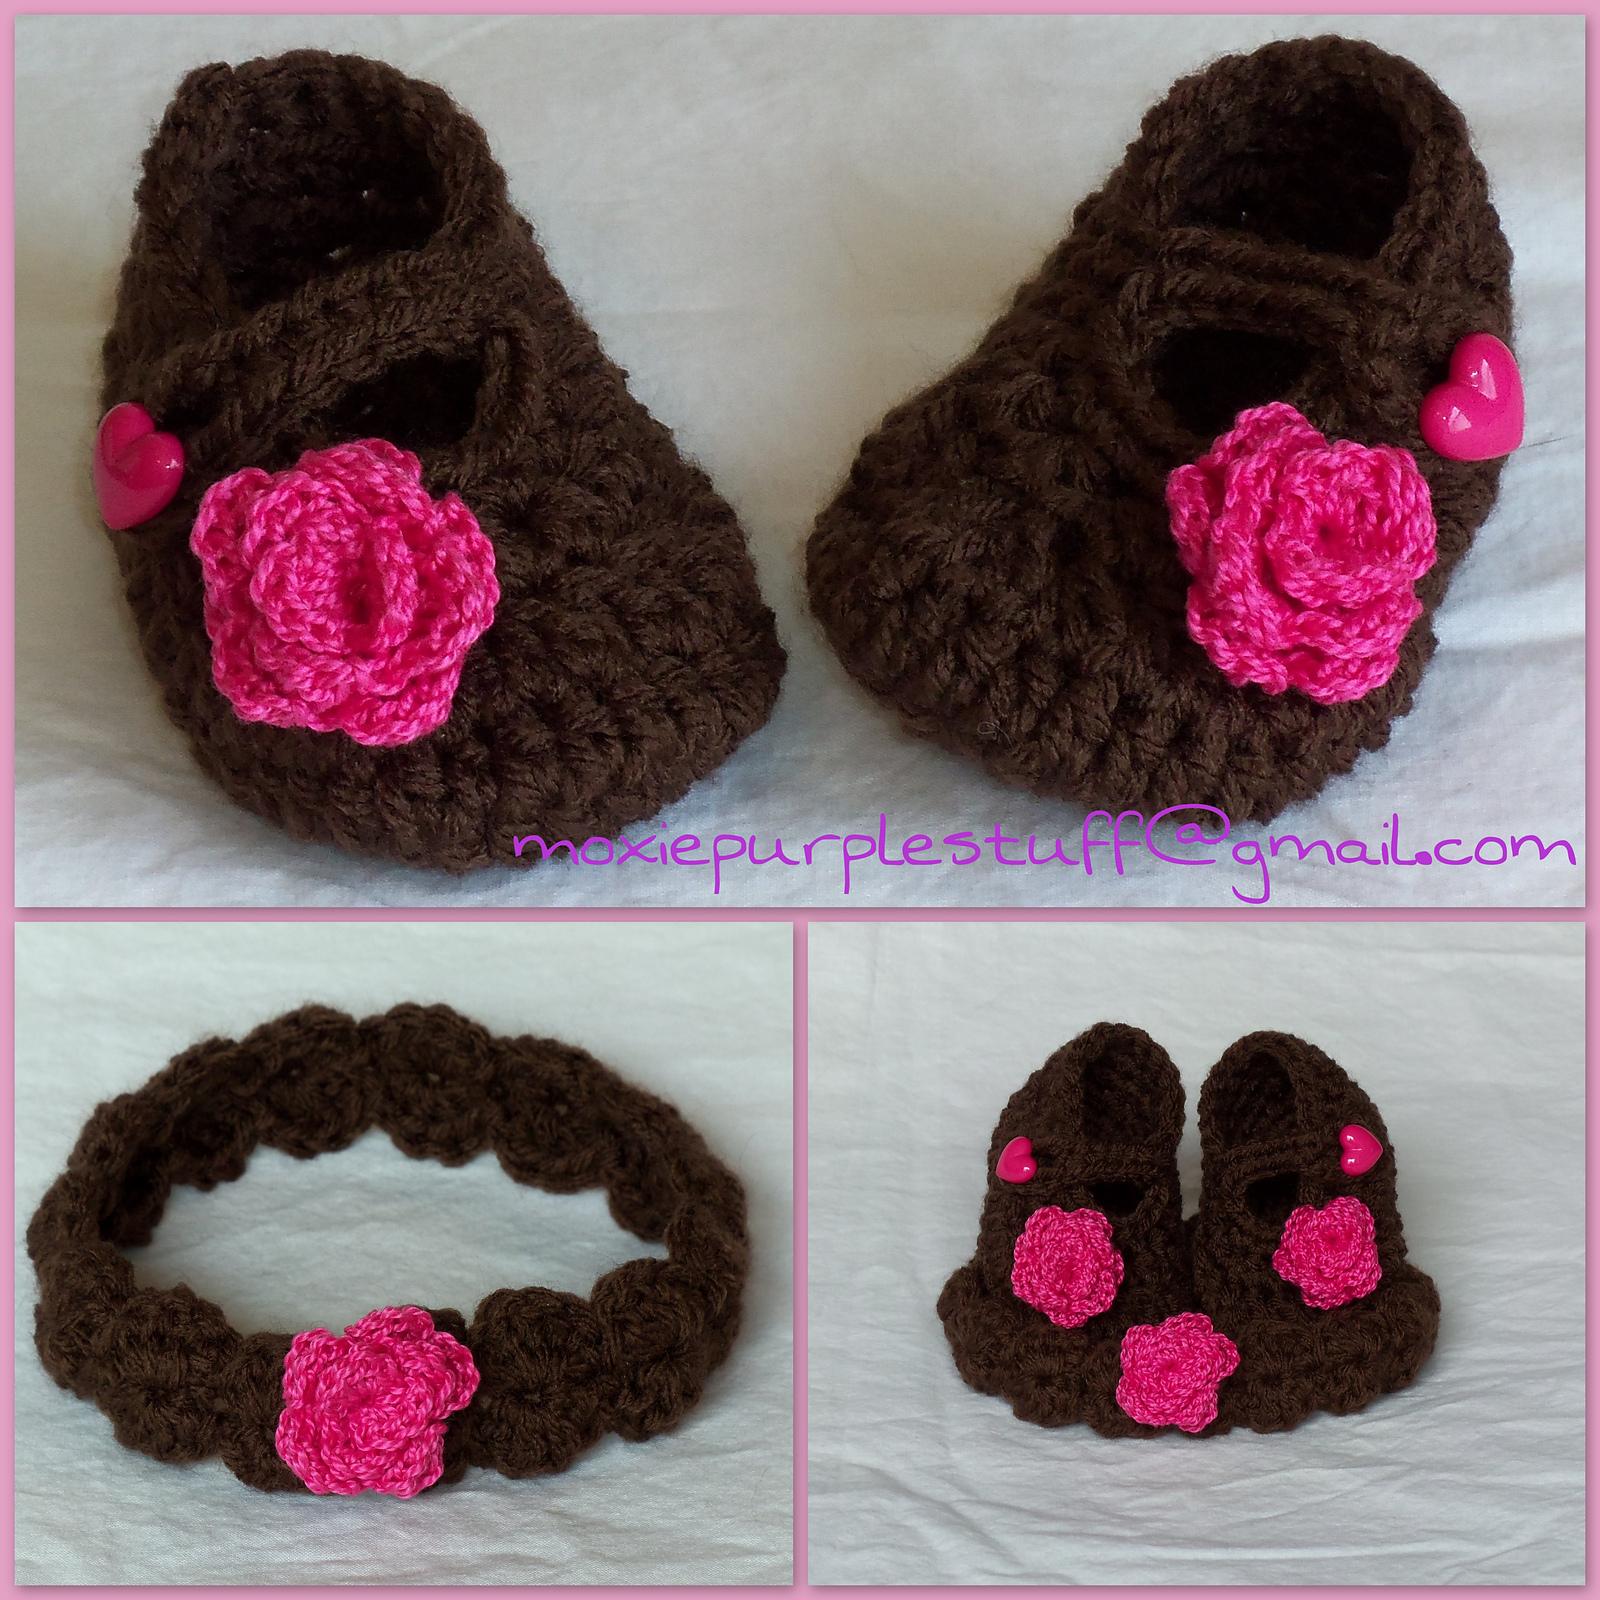 Sunday fan tribute 3 crochet shell headband my merry messy life sunday fan tribute 3 crochet shell headband bankloansurffo Image collections